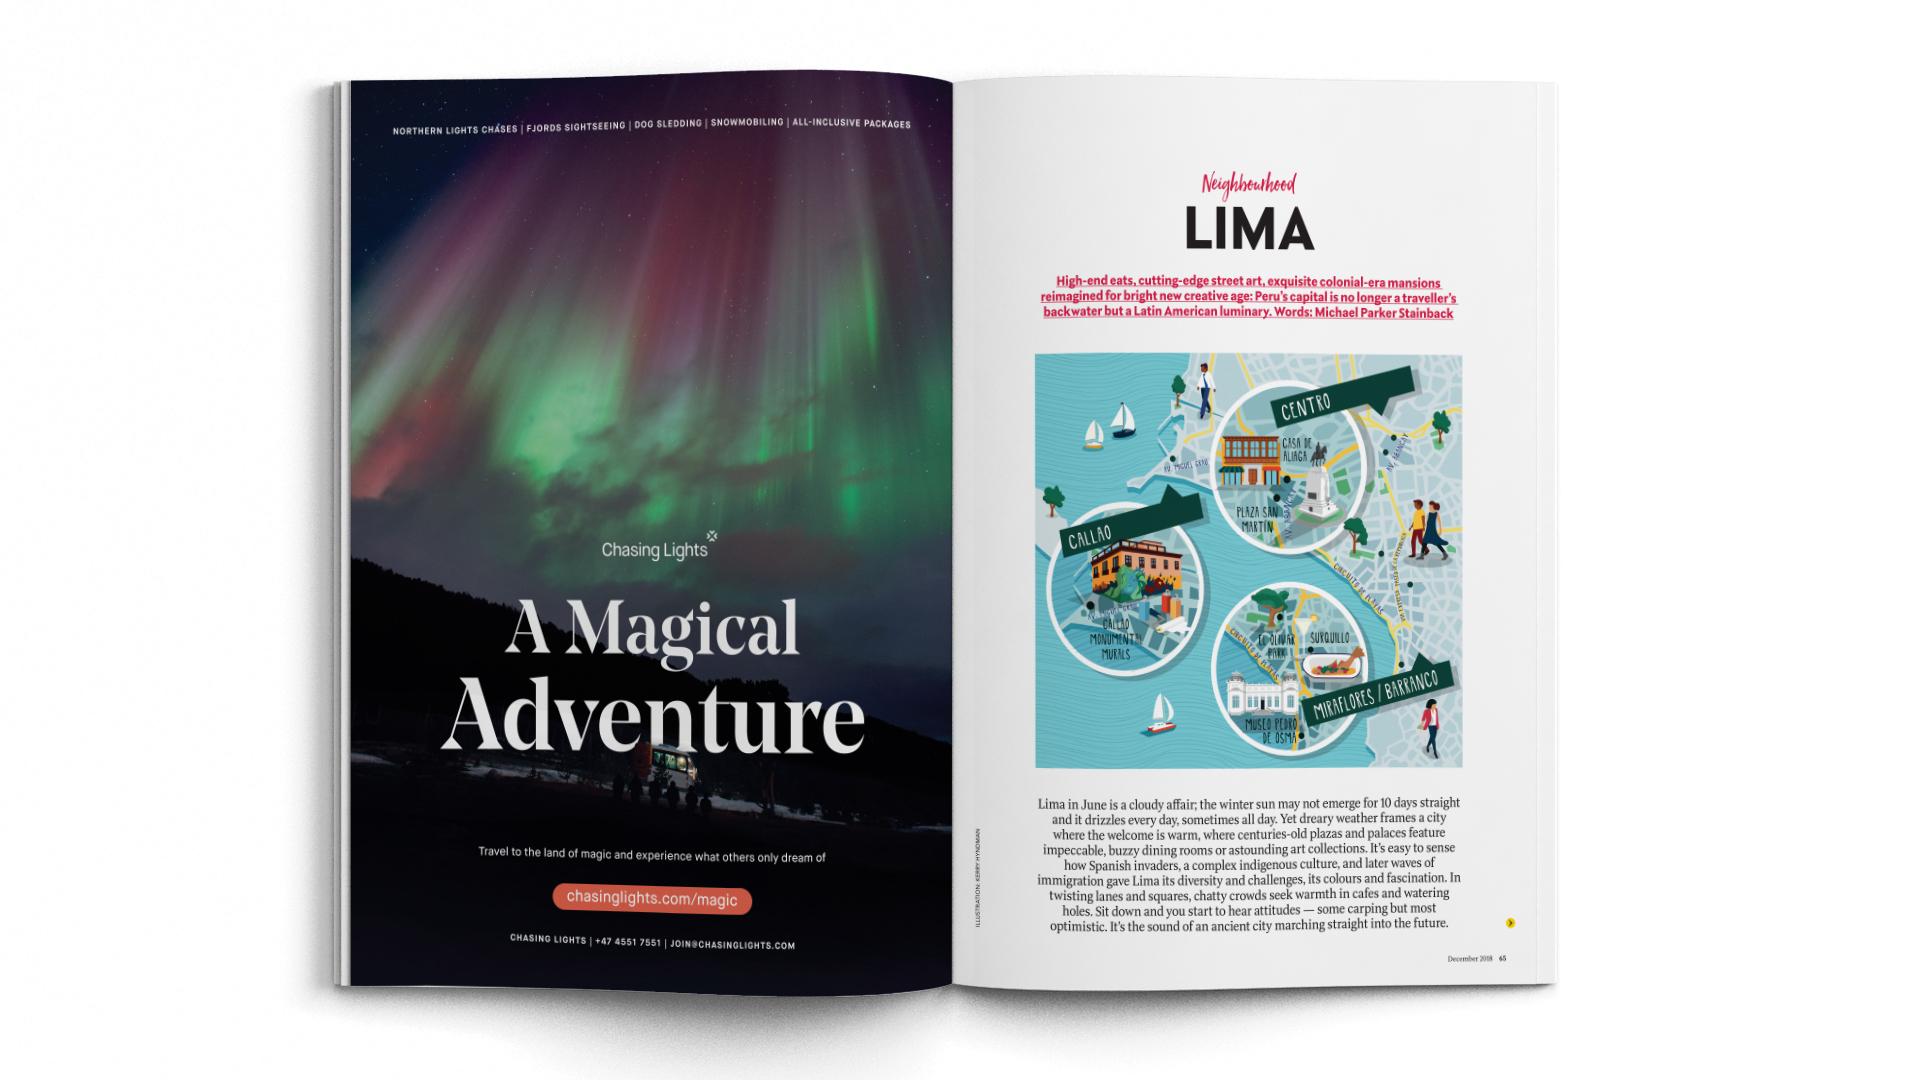 A4-Magazine-DPS-NGT-Lima DEC